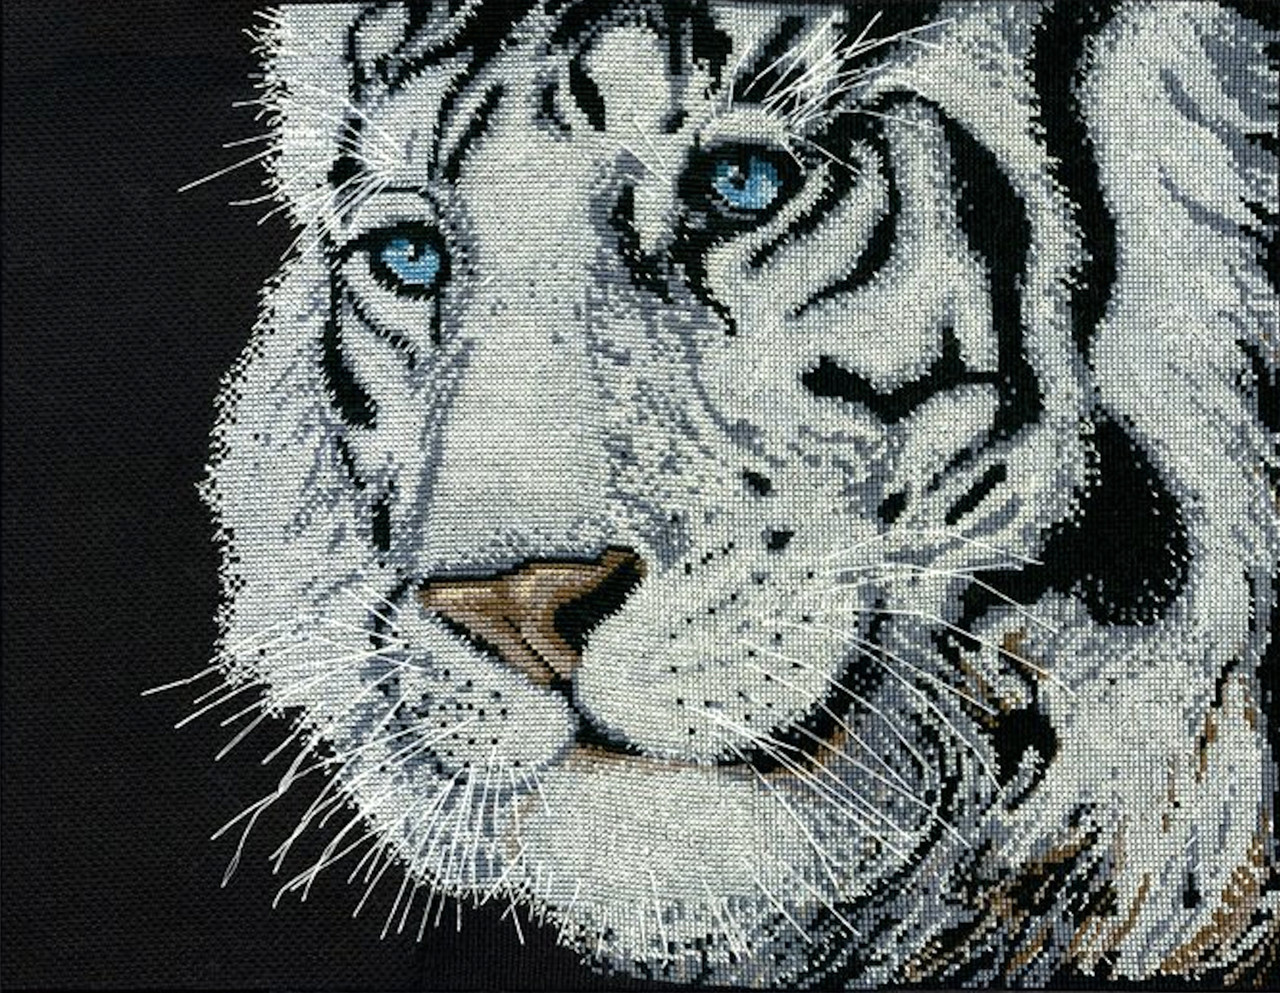 Design Works -  The White Tiger